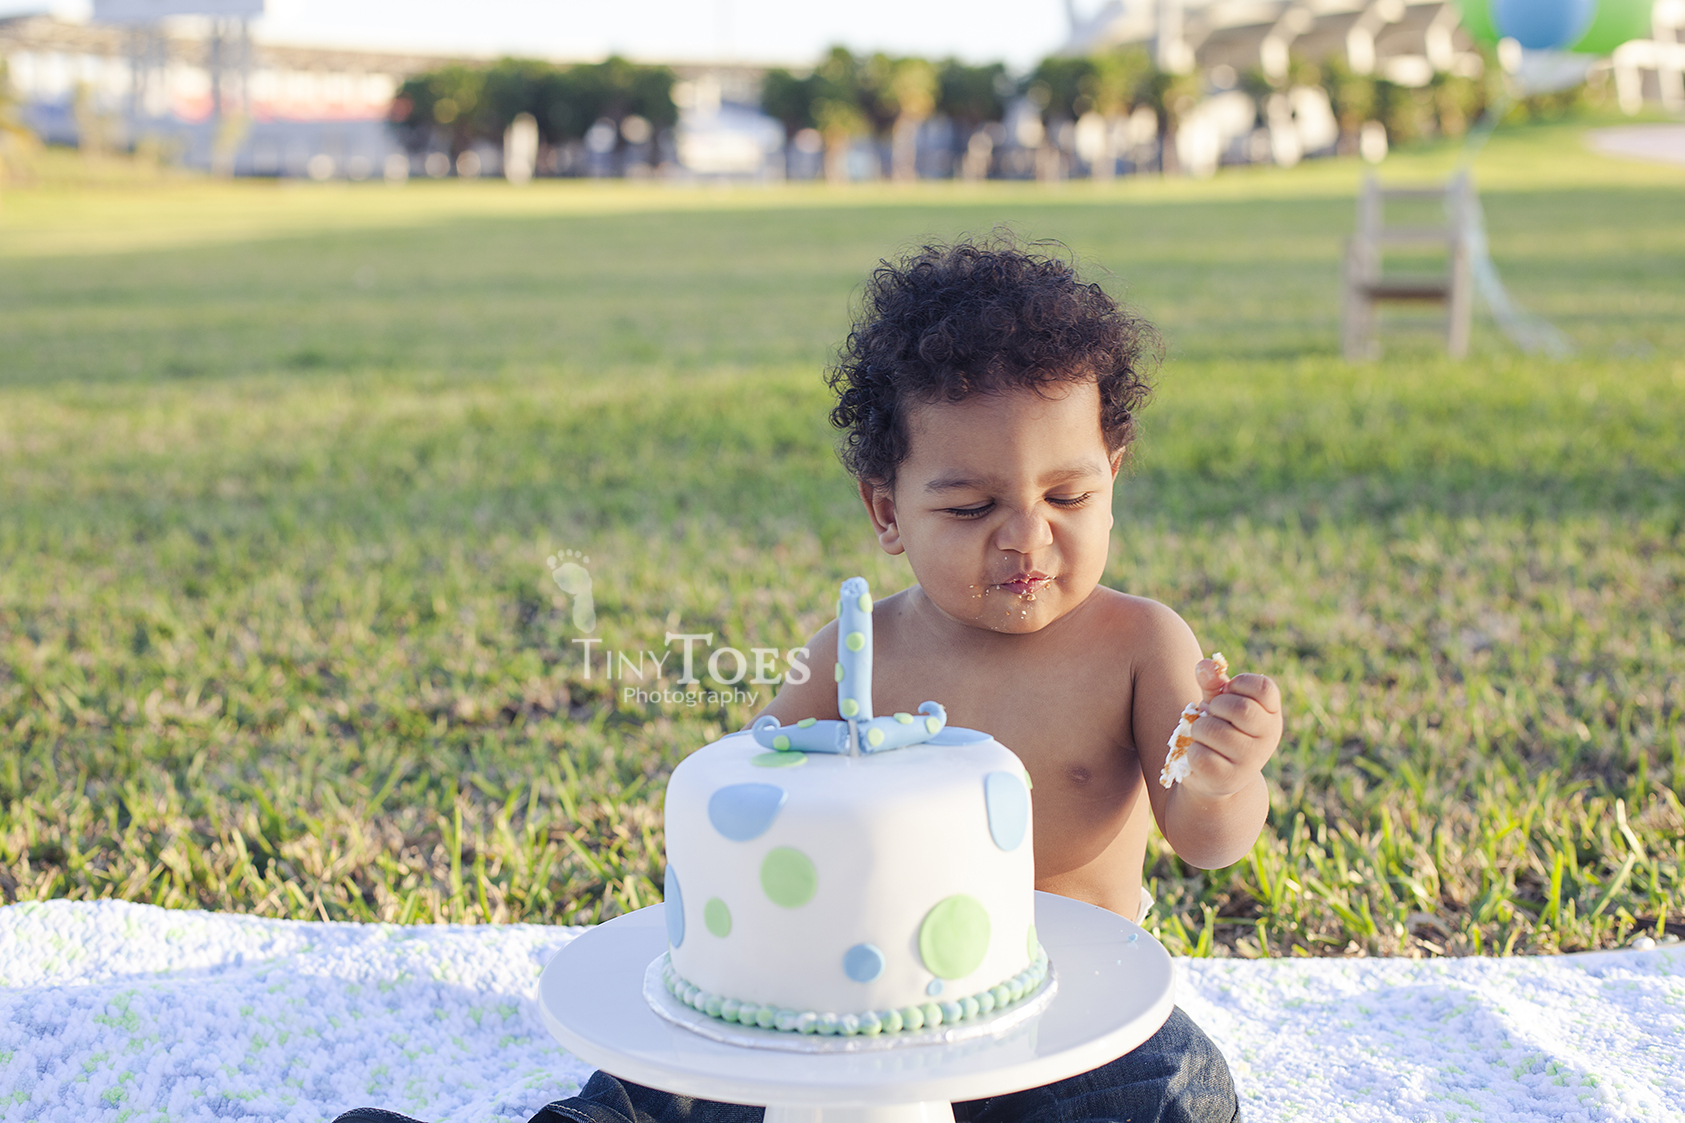 Tiny Toes Photography | Nassau, Bahamas Children Photographer